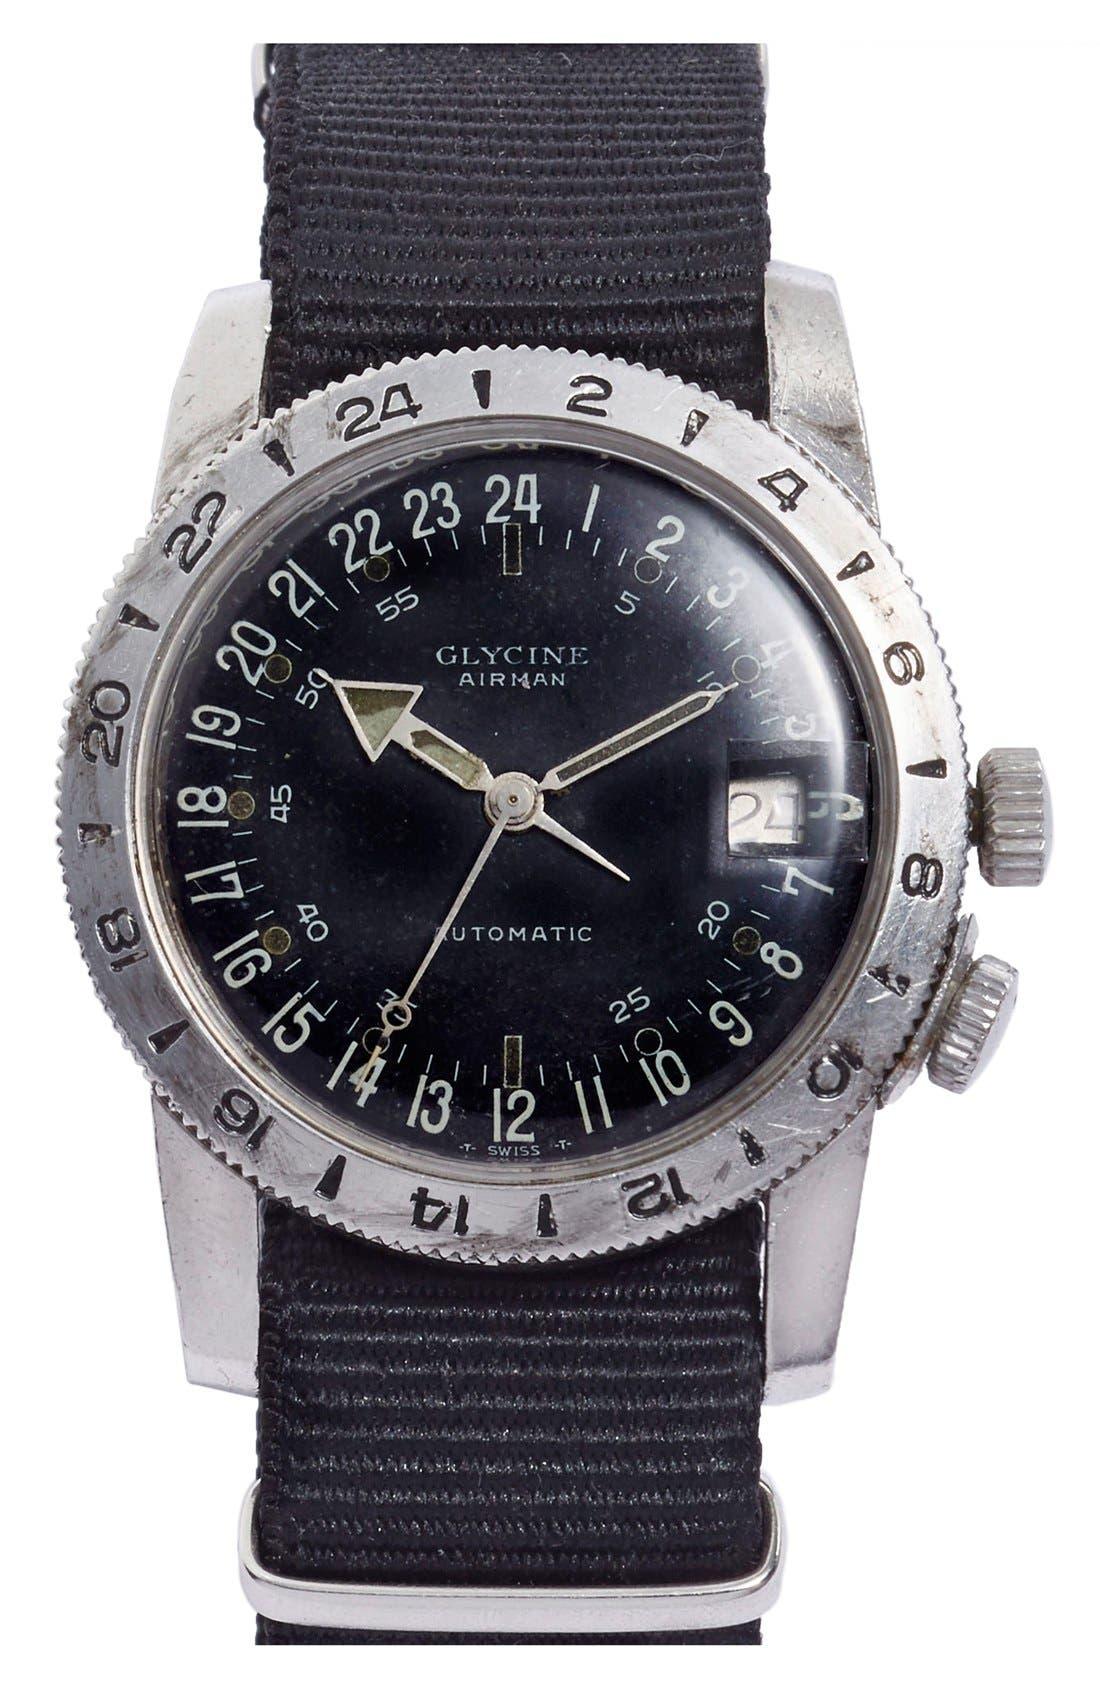 FOOTHILLS CA 'Glycine Airman' Vintage Vietnam Pilot's Watch, 37mm, Main, color, 001